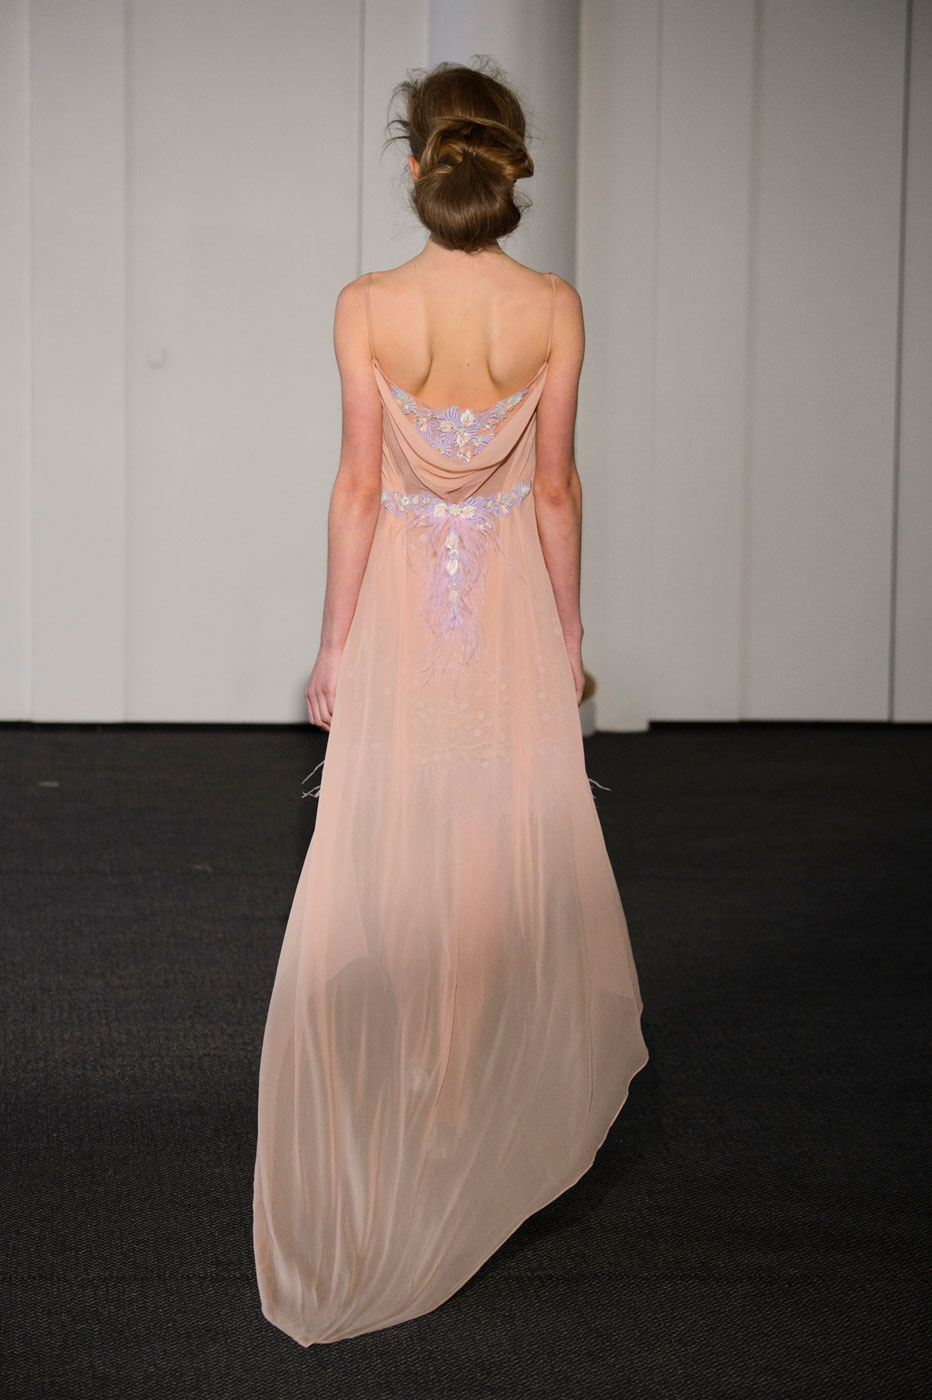 Busardi-fashion-runway-show-haute-couture-paris-spring-2015-the-impression-33